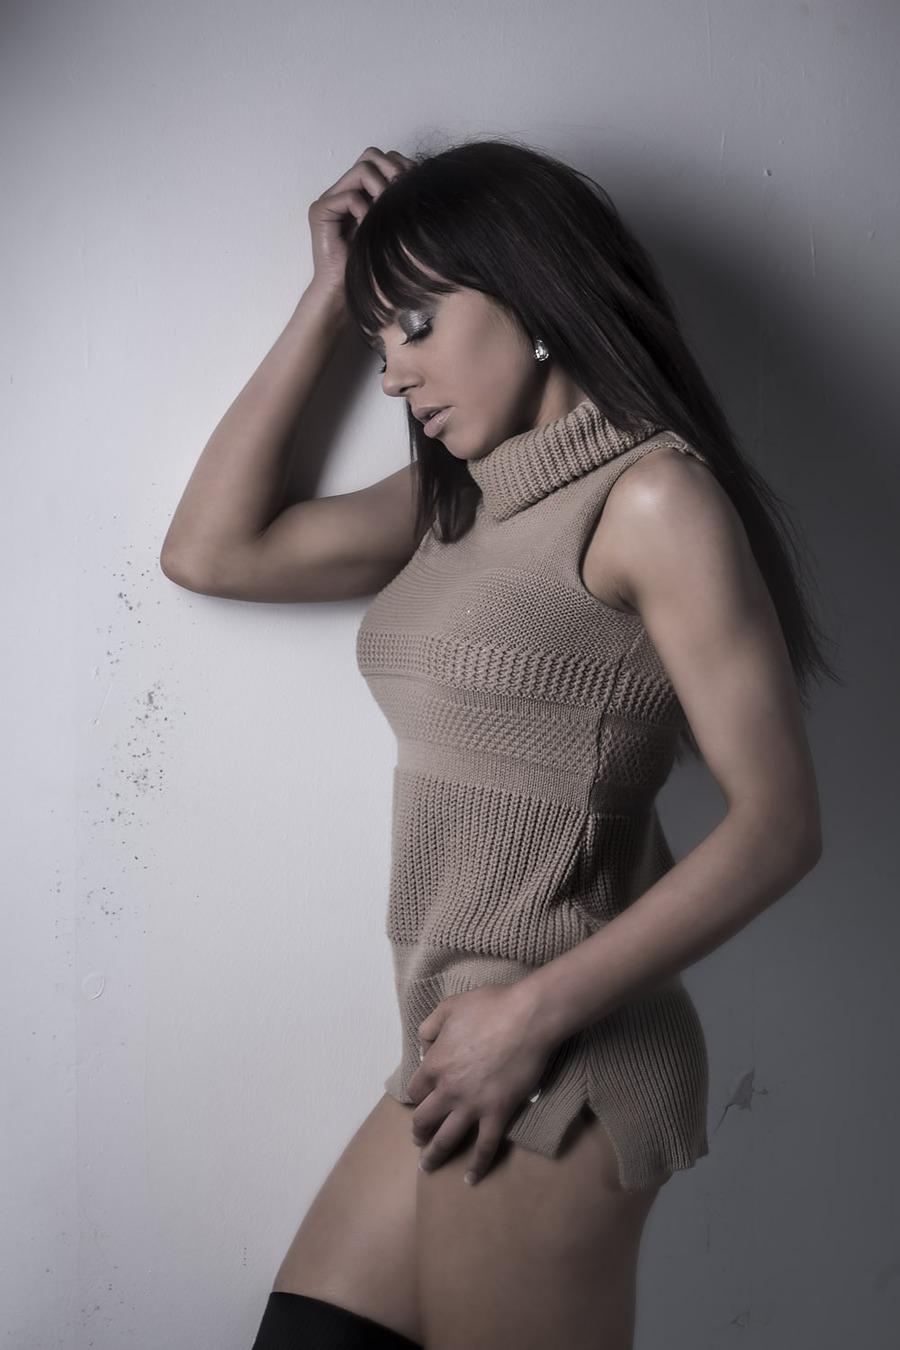 Deep In Thought / Photography by John Baikie, Model Jen_981, Makeup by Jen_981, Hair styling by Jen_981 / Uploaded 24th February 2016 @ 05:15 PM